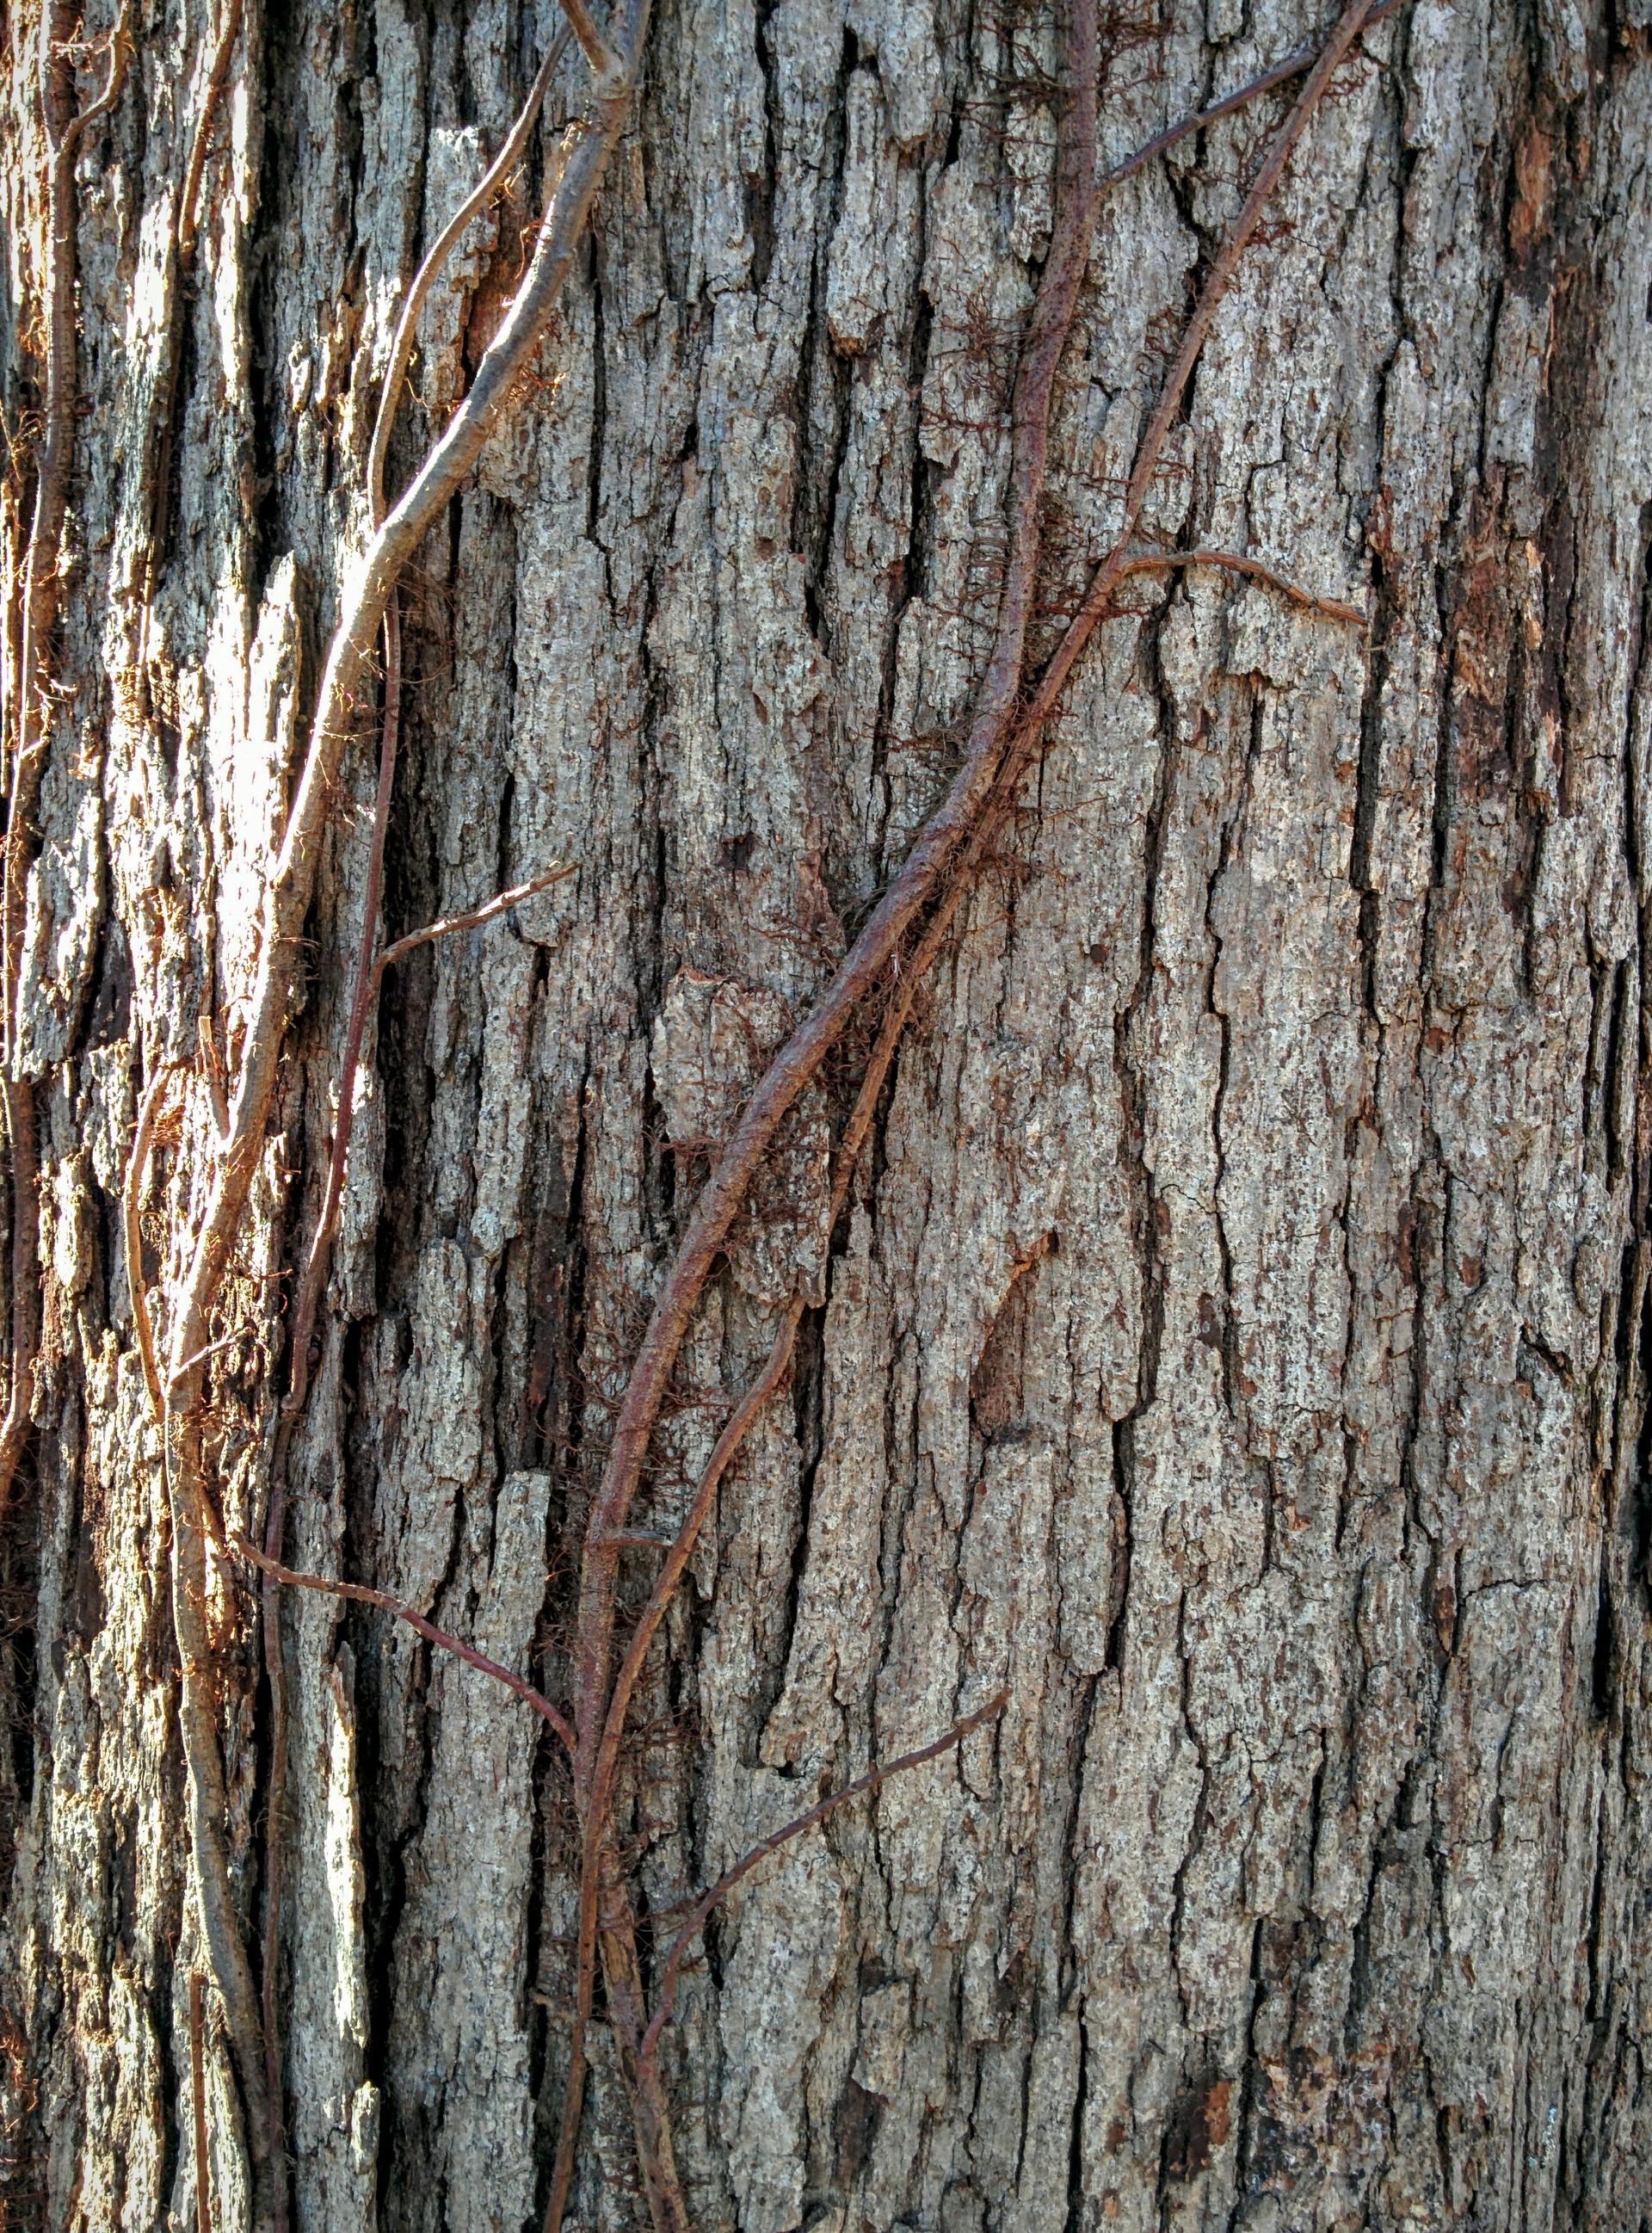 clinging vines | jrcastine, background, bark, detail